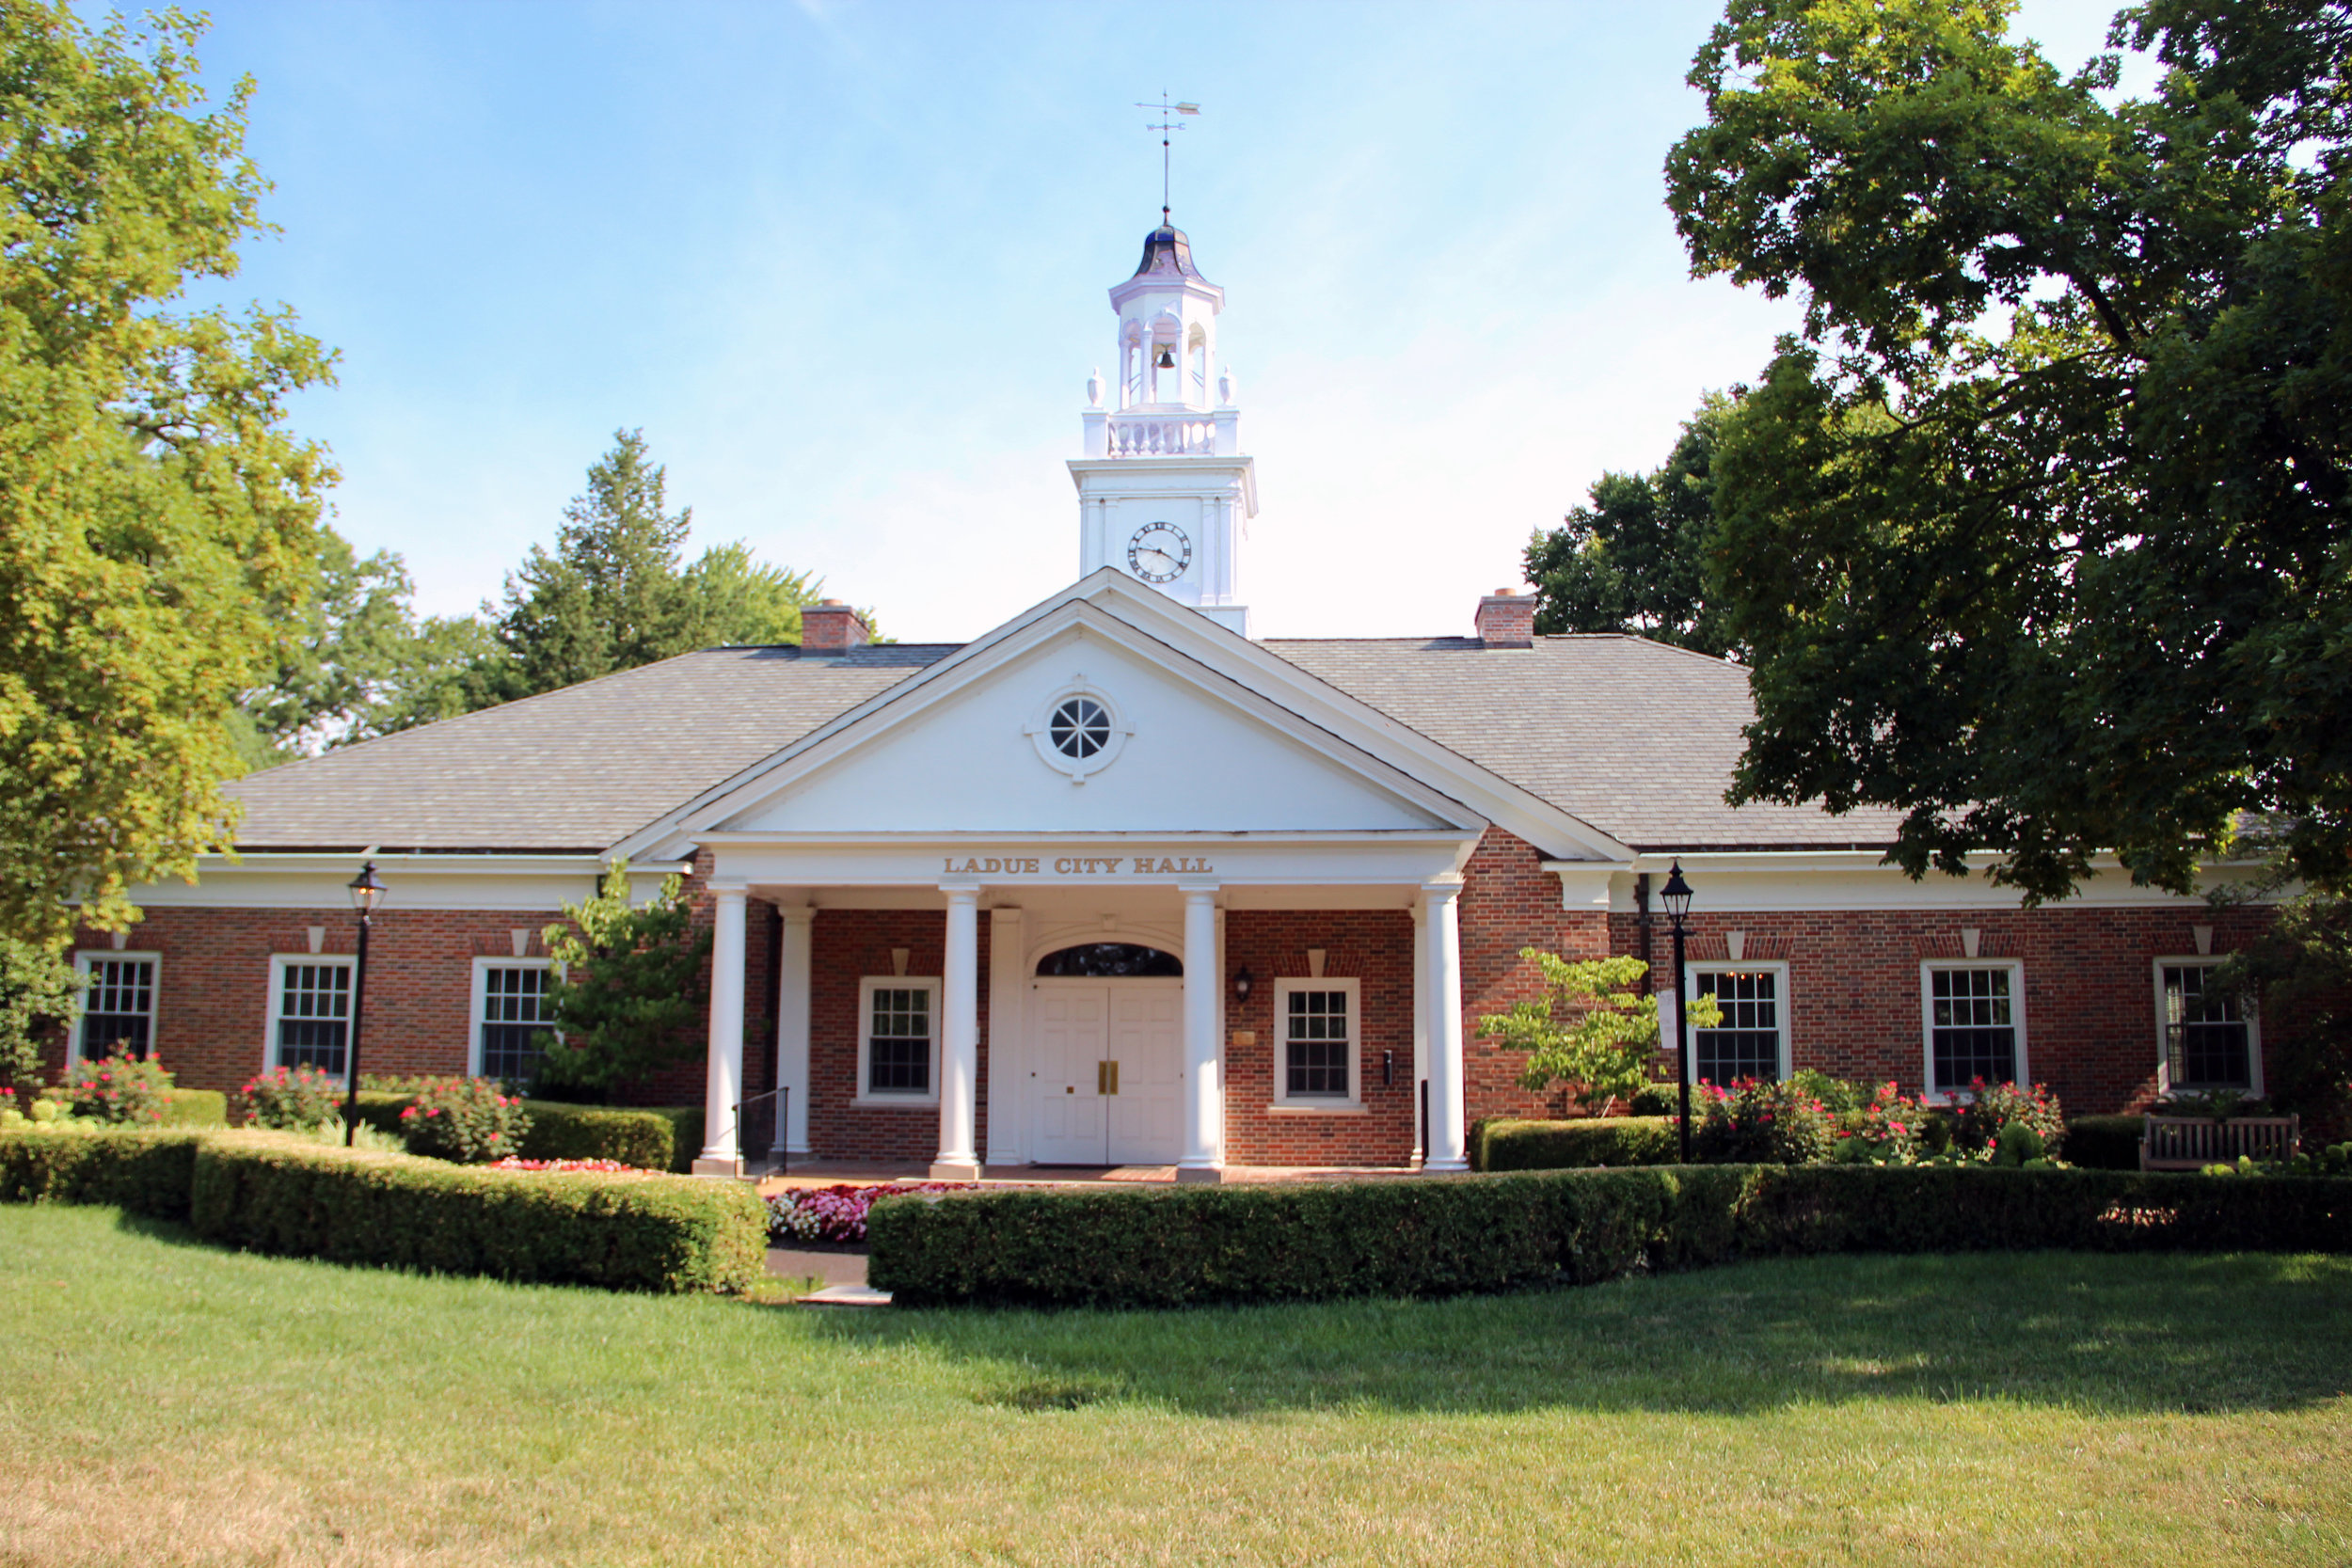 Ladue City Hall